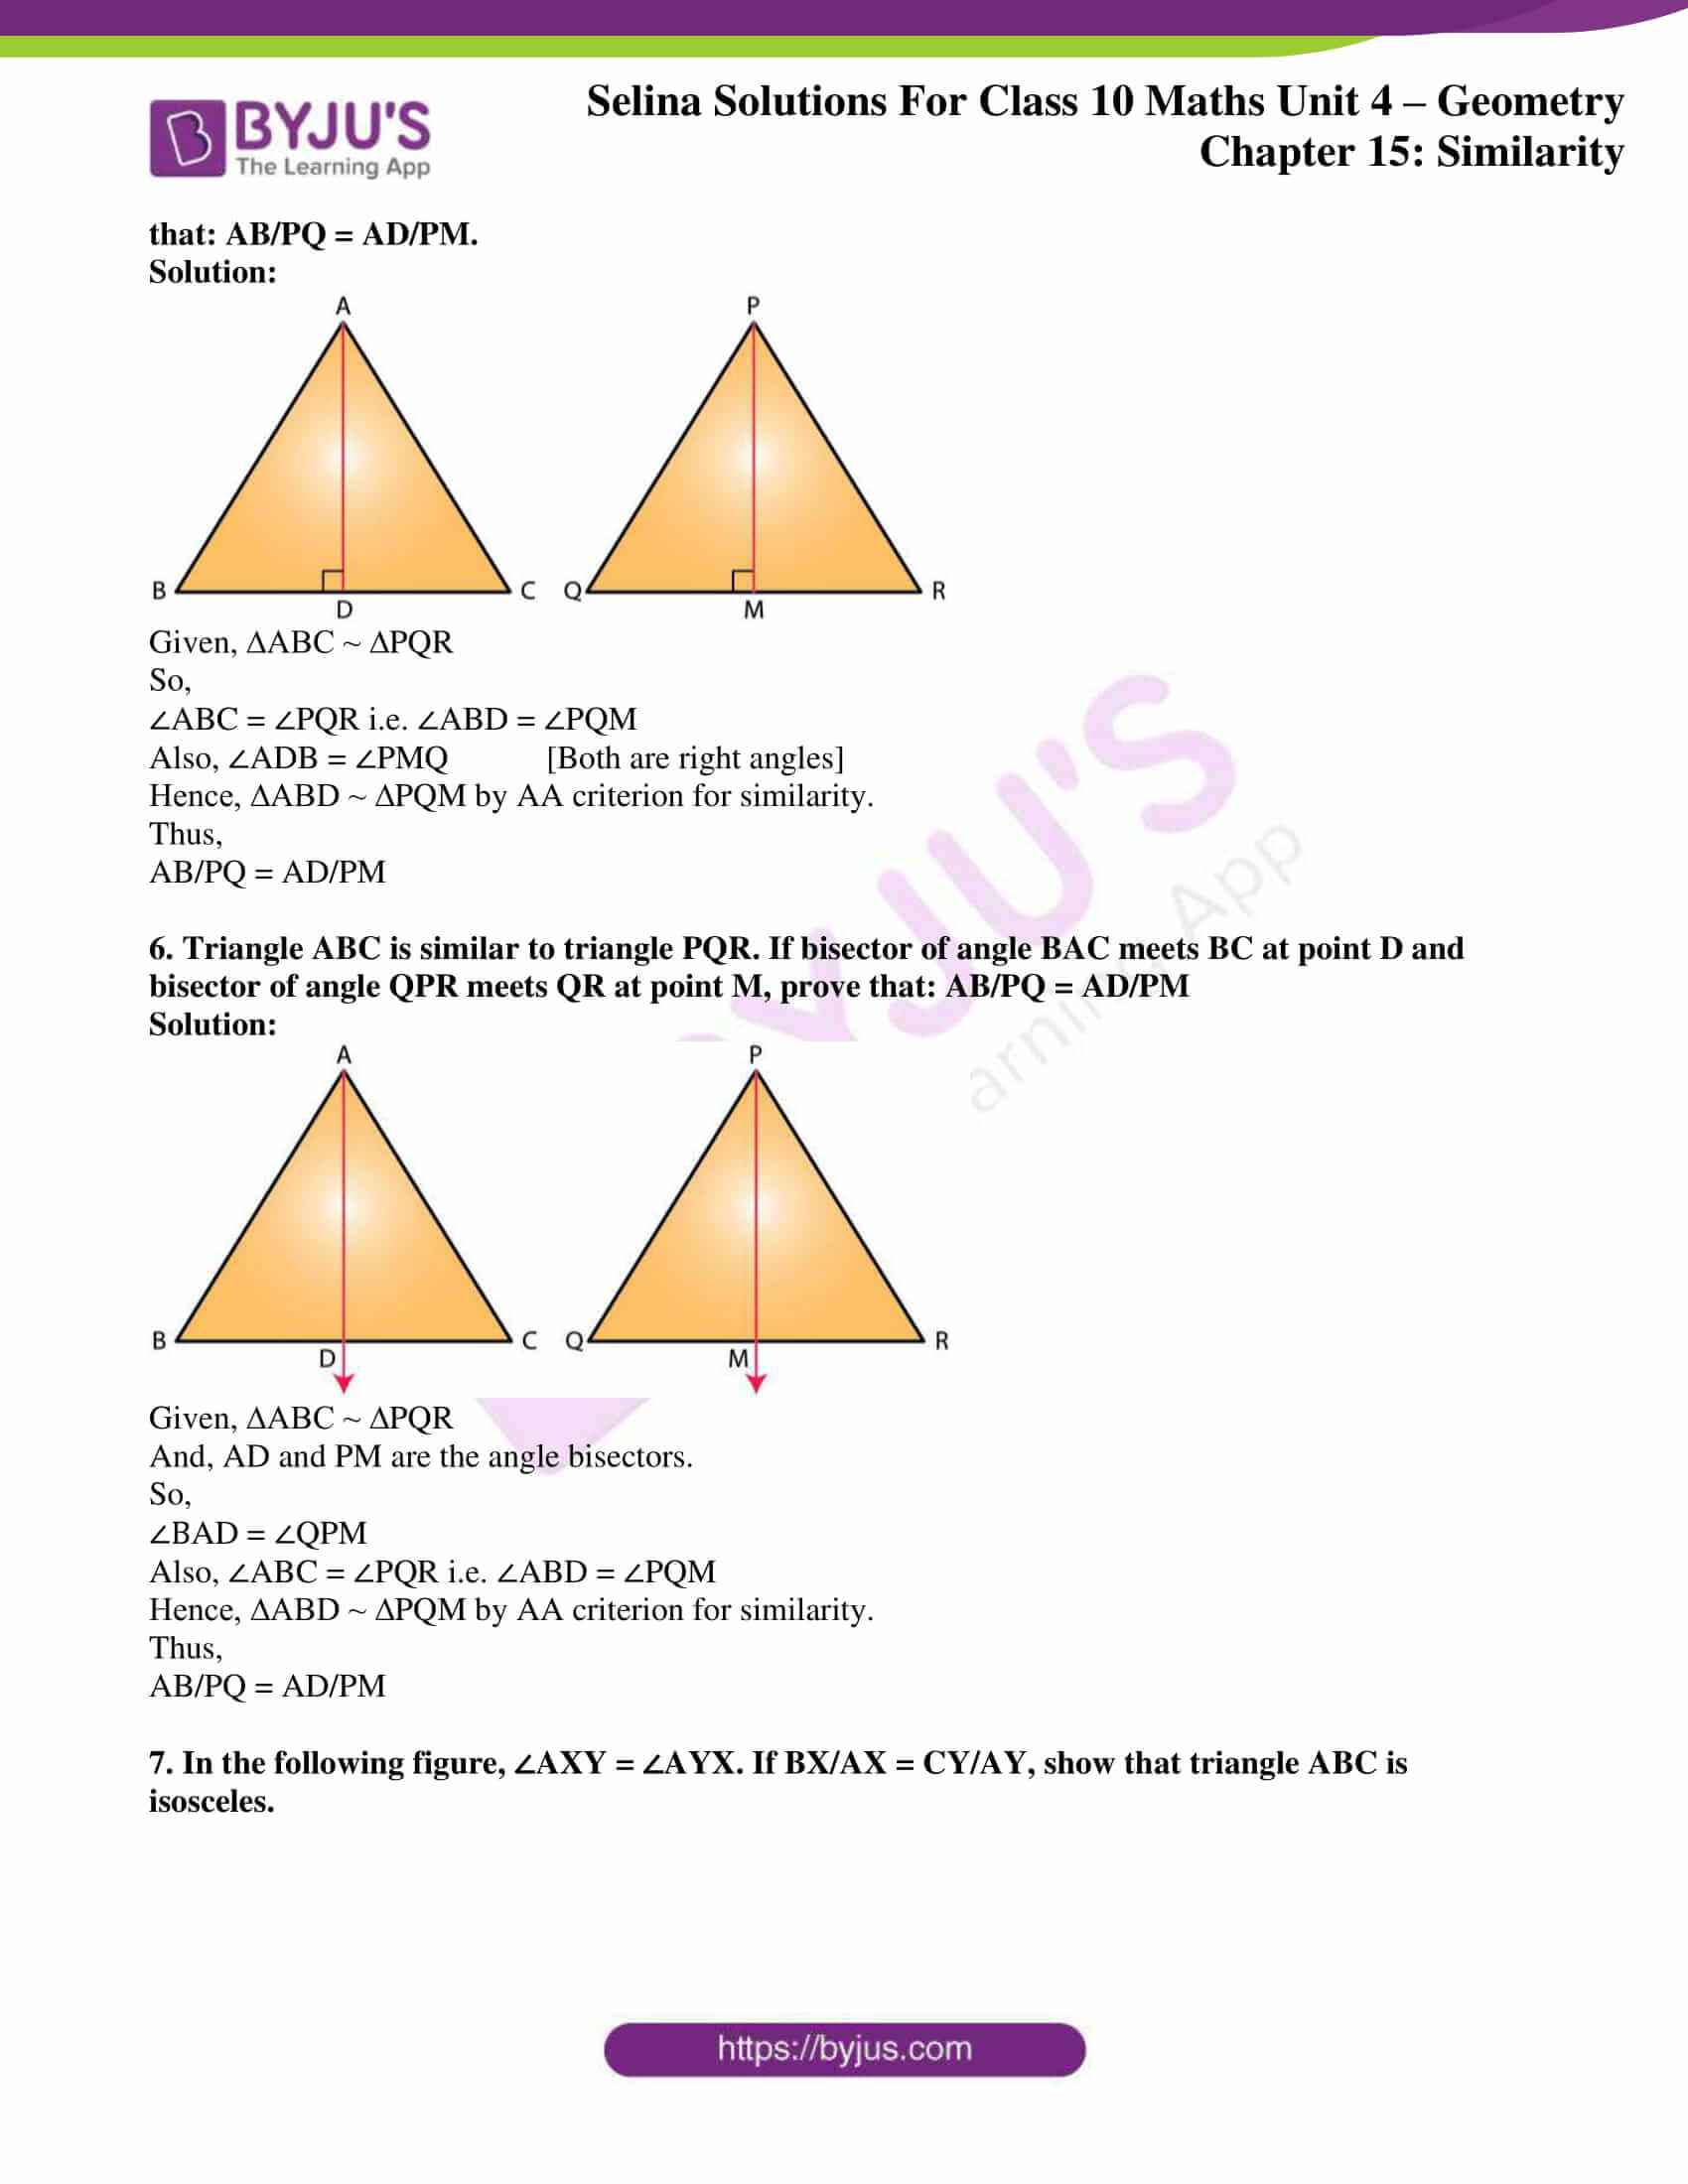 selina-sol-maths-class-10-ch-15-ex-e-4